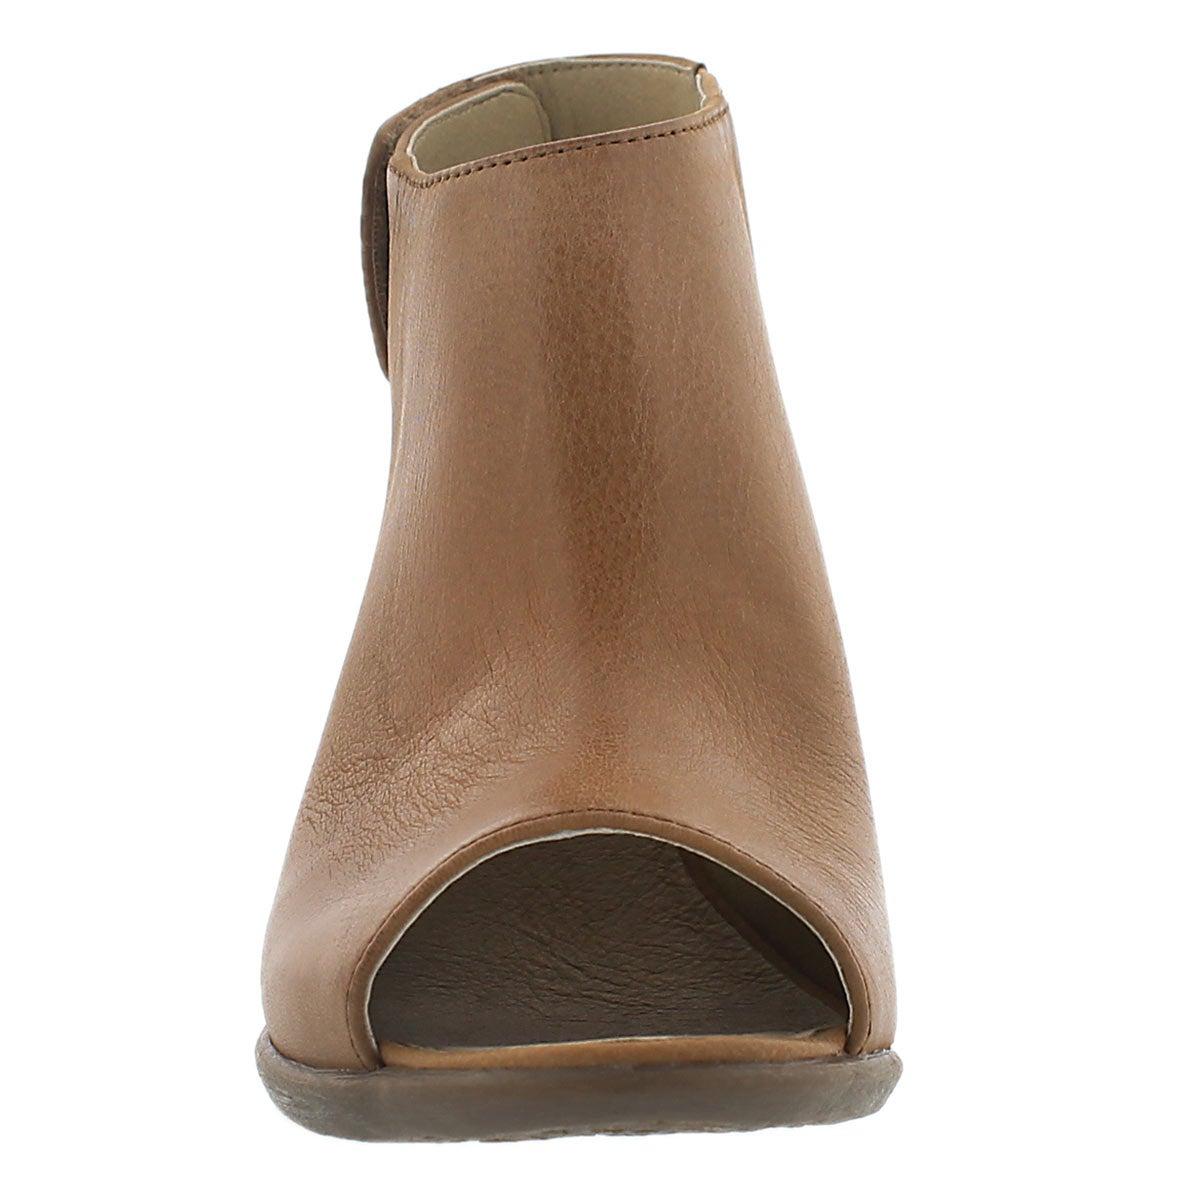 Lds Bonnie 09 brass peep toe heel